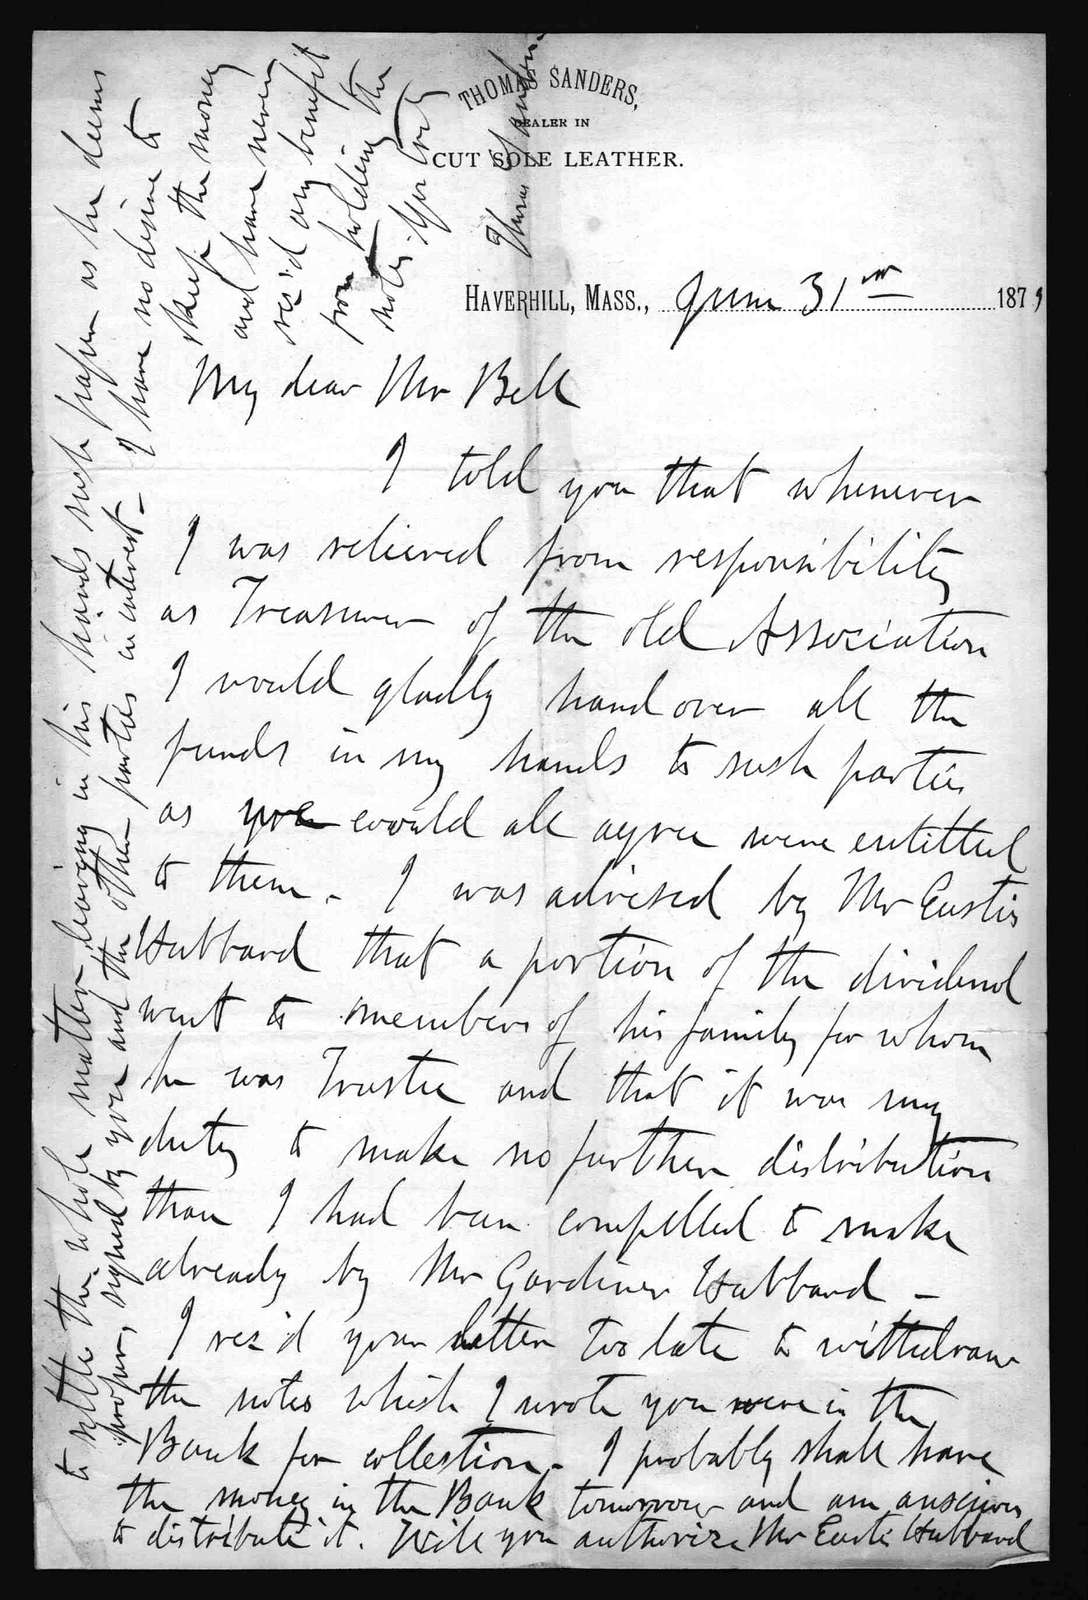 Letter from Thomas Sanders to Alexander Graham Bell, June 31, 1879